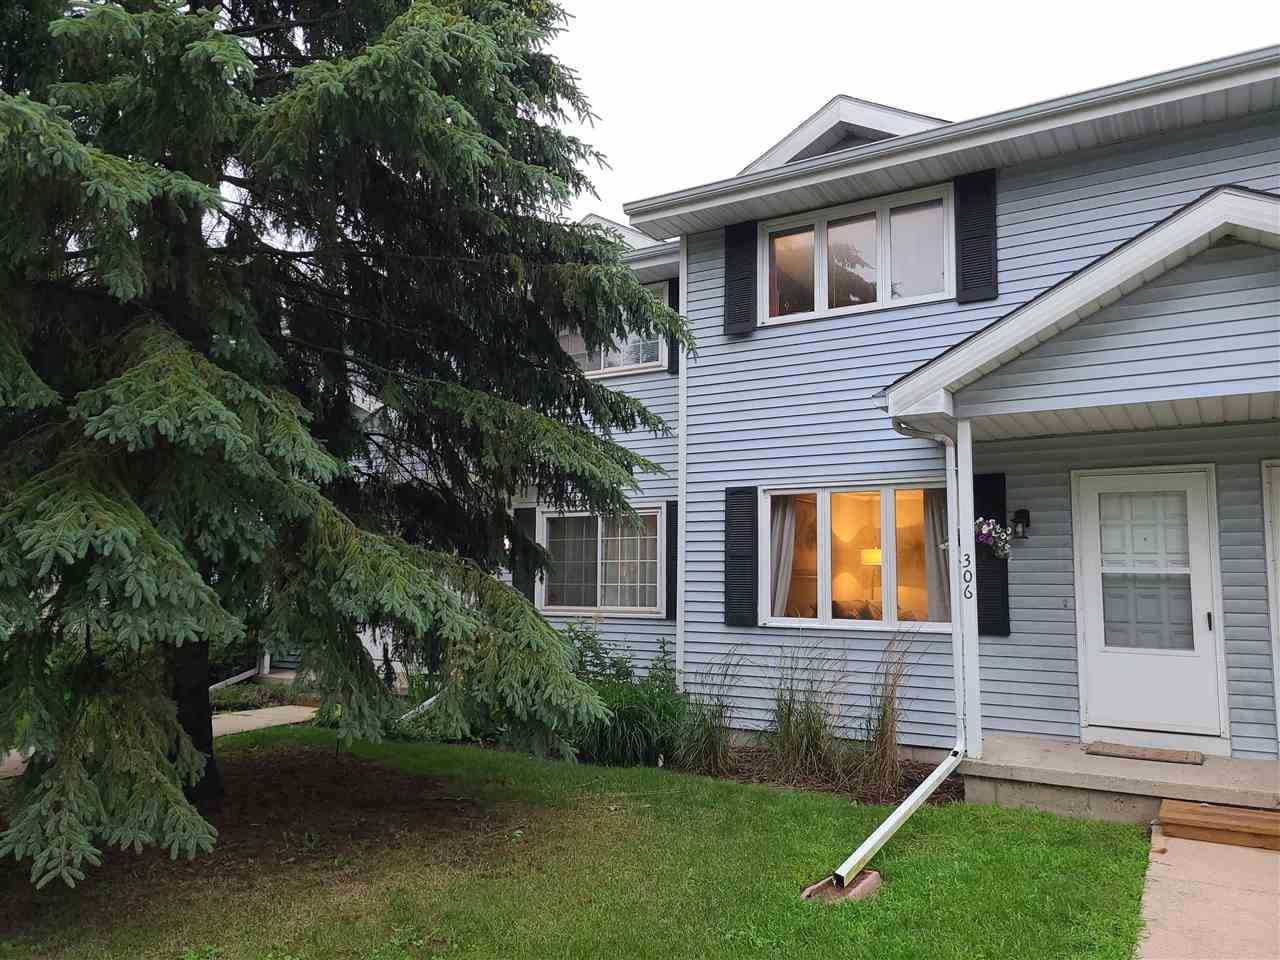 306 Swanton Rd, Madison, WI 53714 - #: 1914976